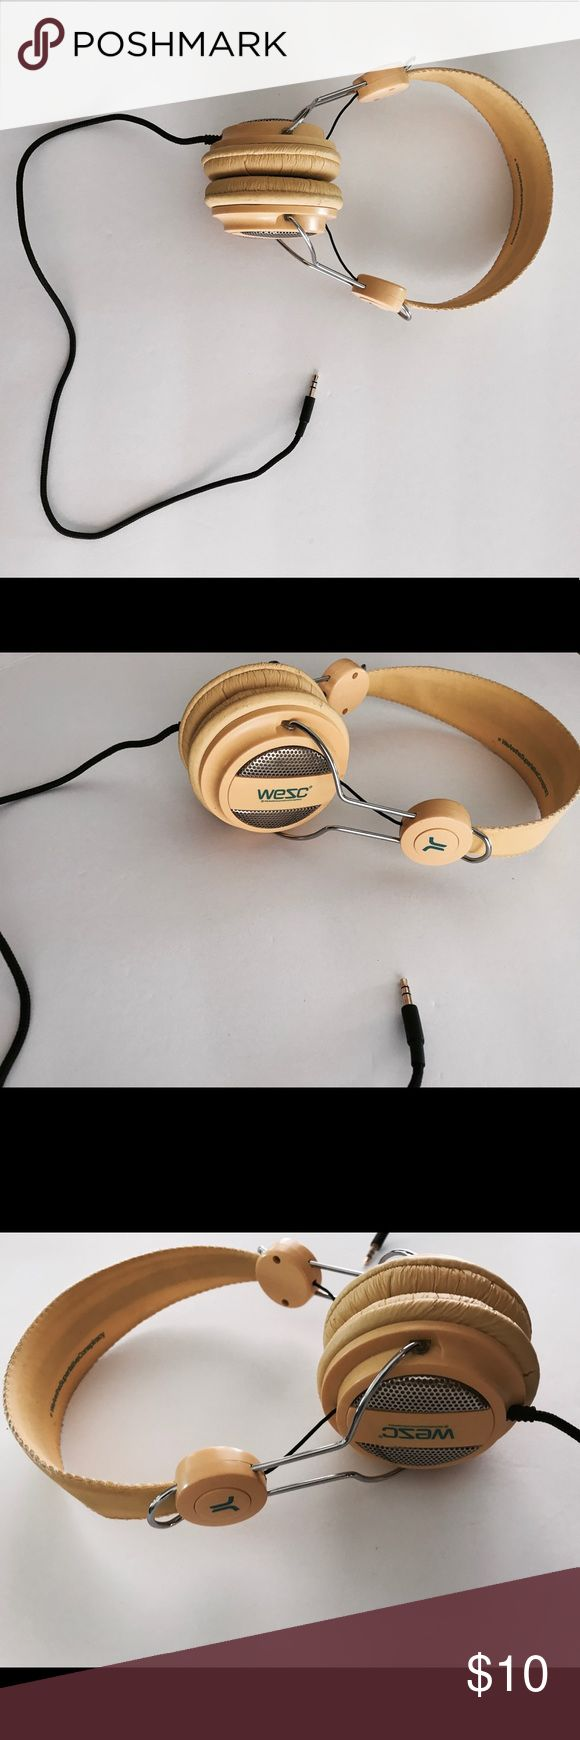 Wesc headphones Yellow wesc headphones with extender cord. Wesc Other